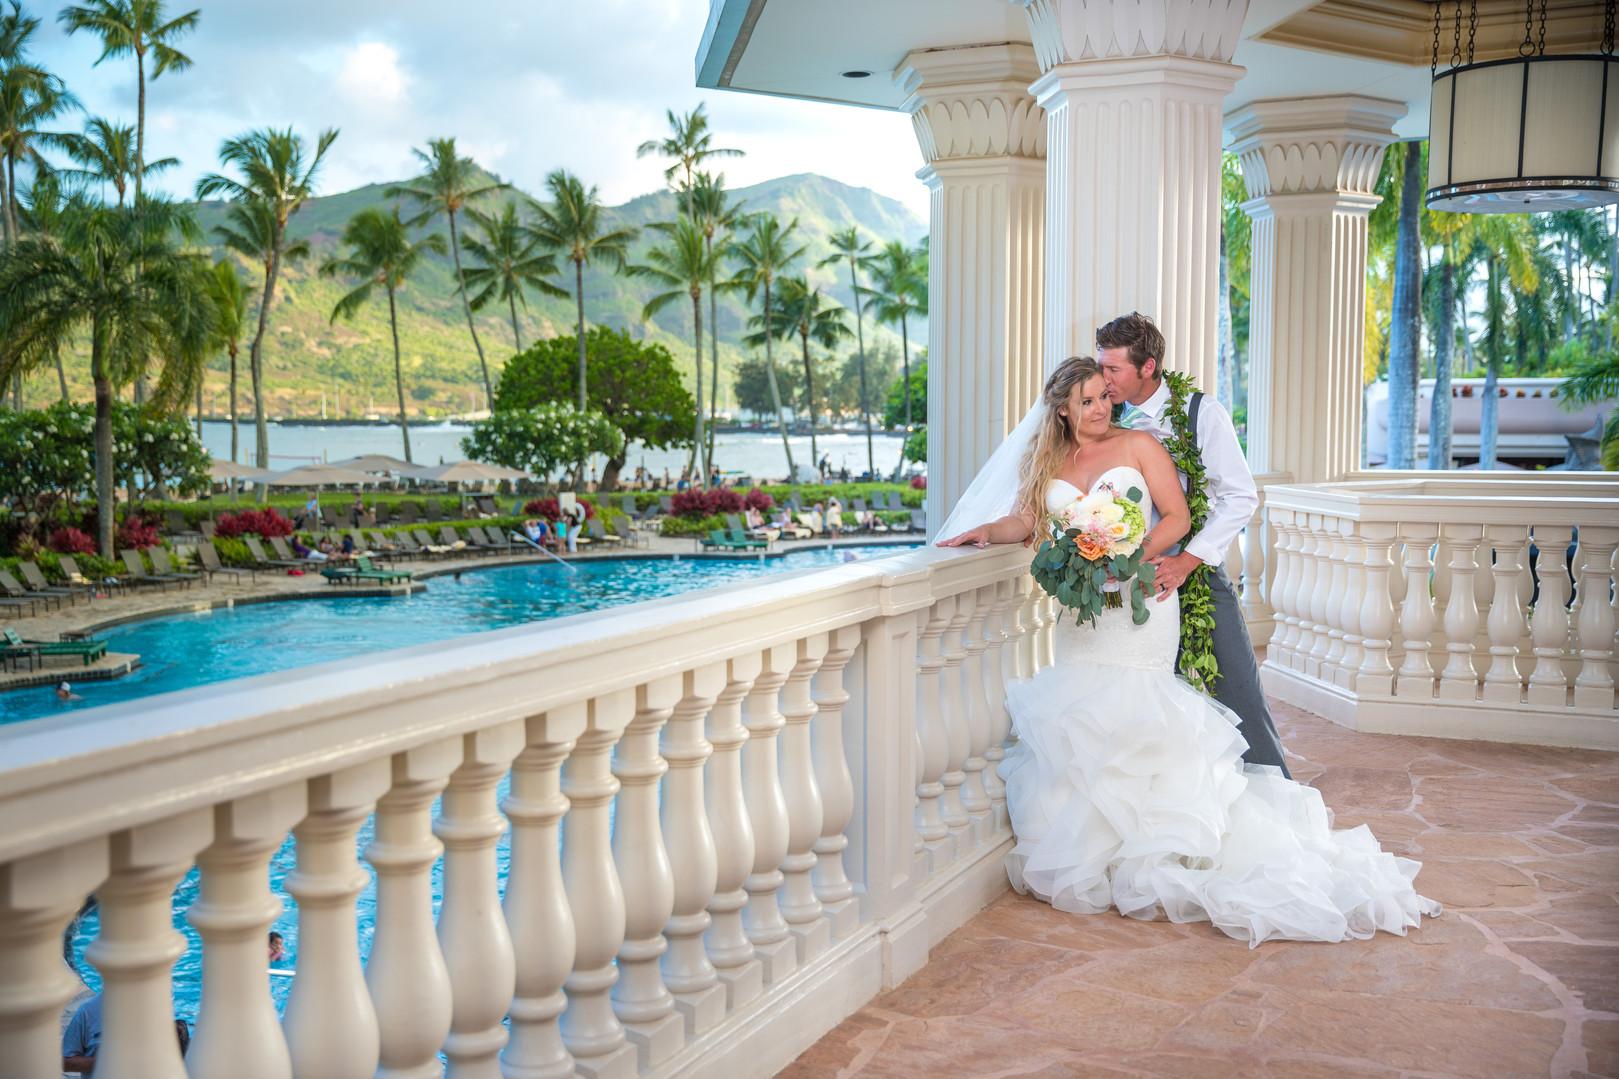 All_Wedding_Photos-PRINT-698.jpg